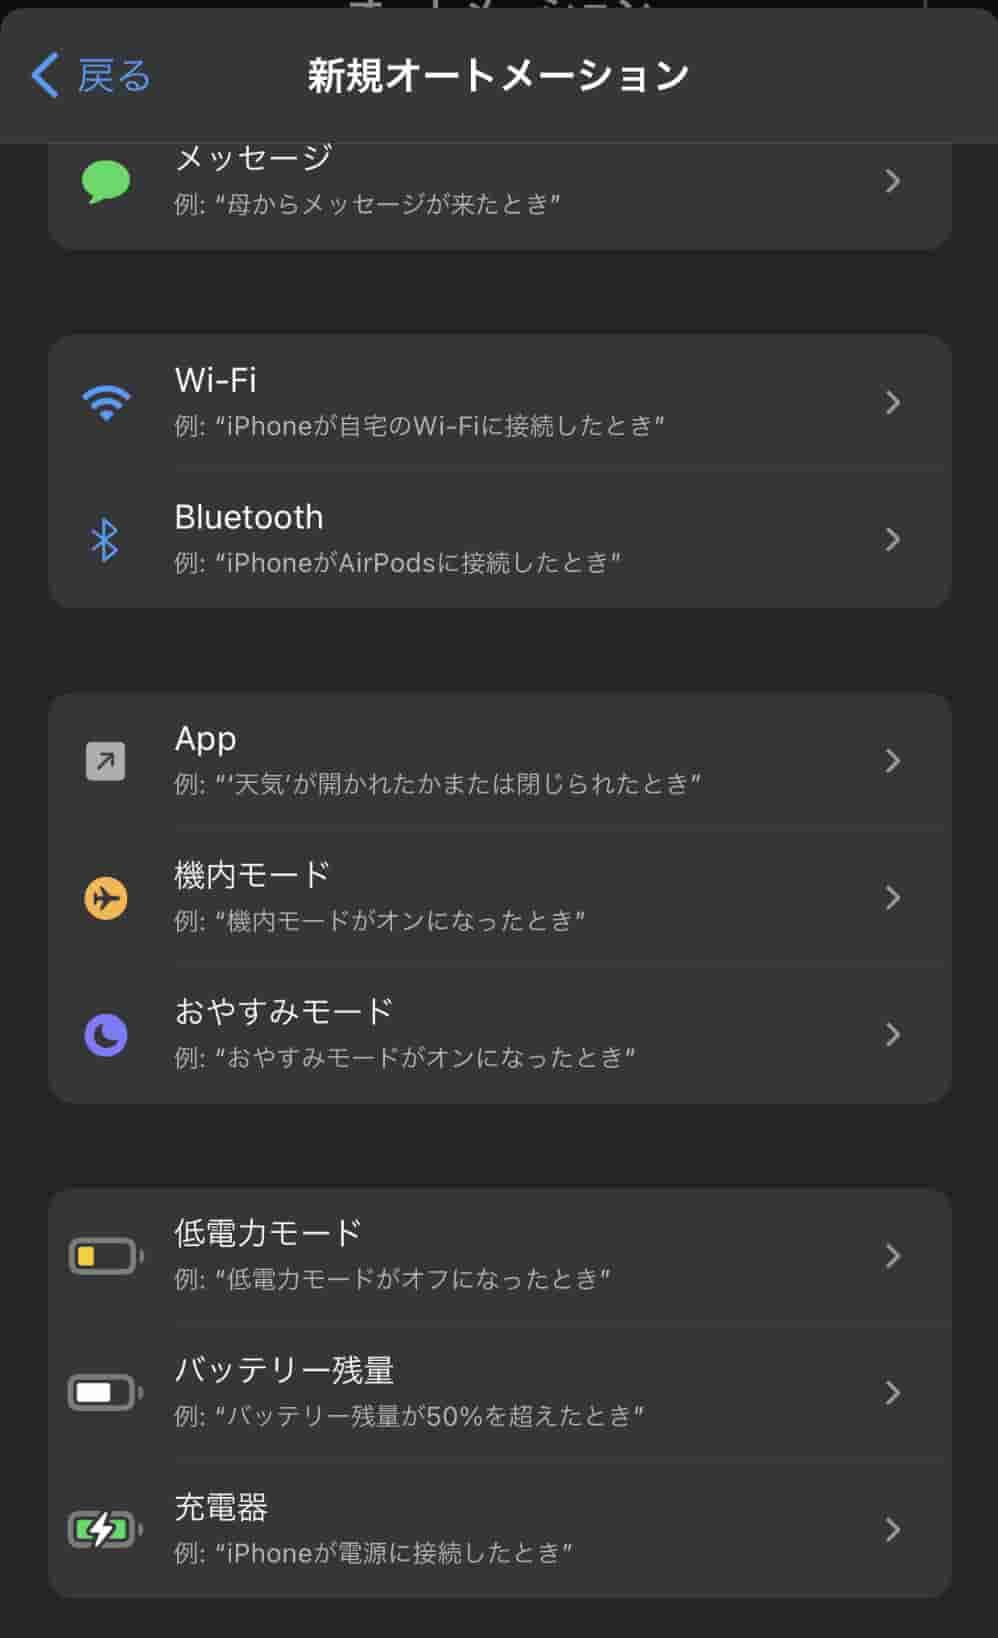 Iphone 省エネ モード